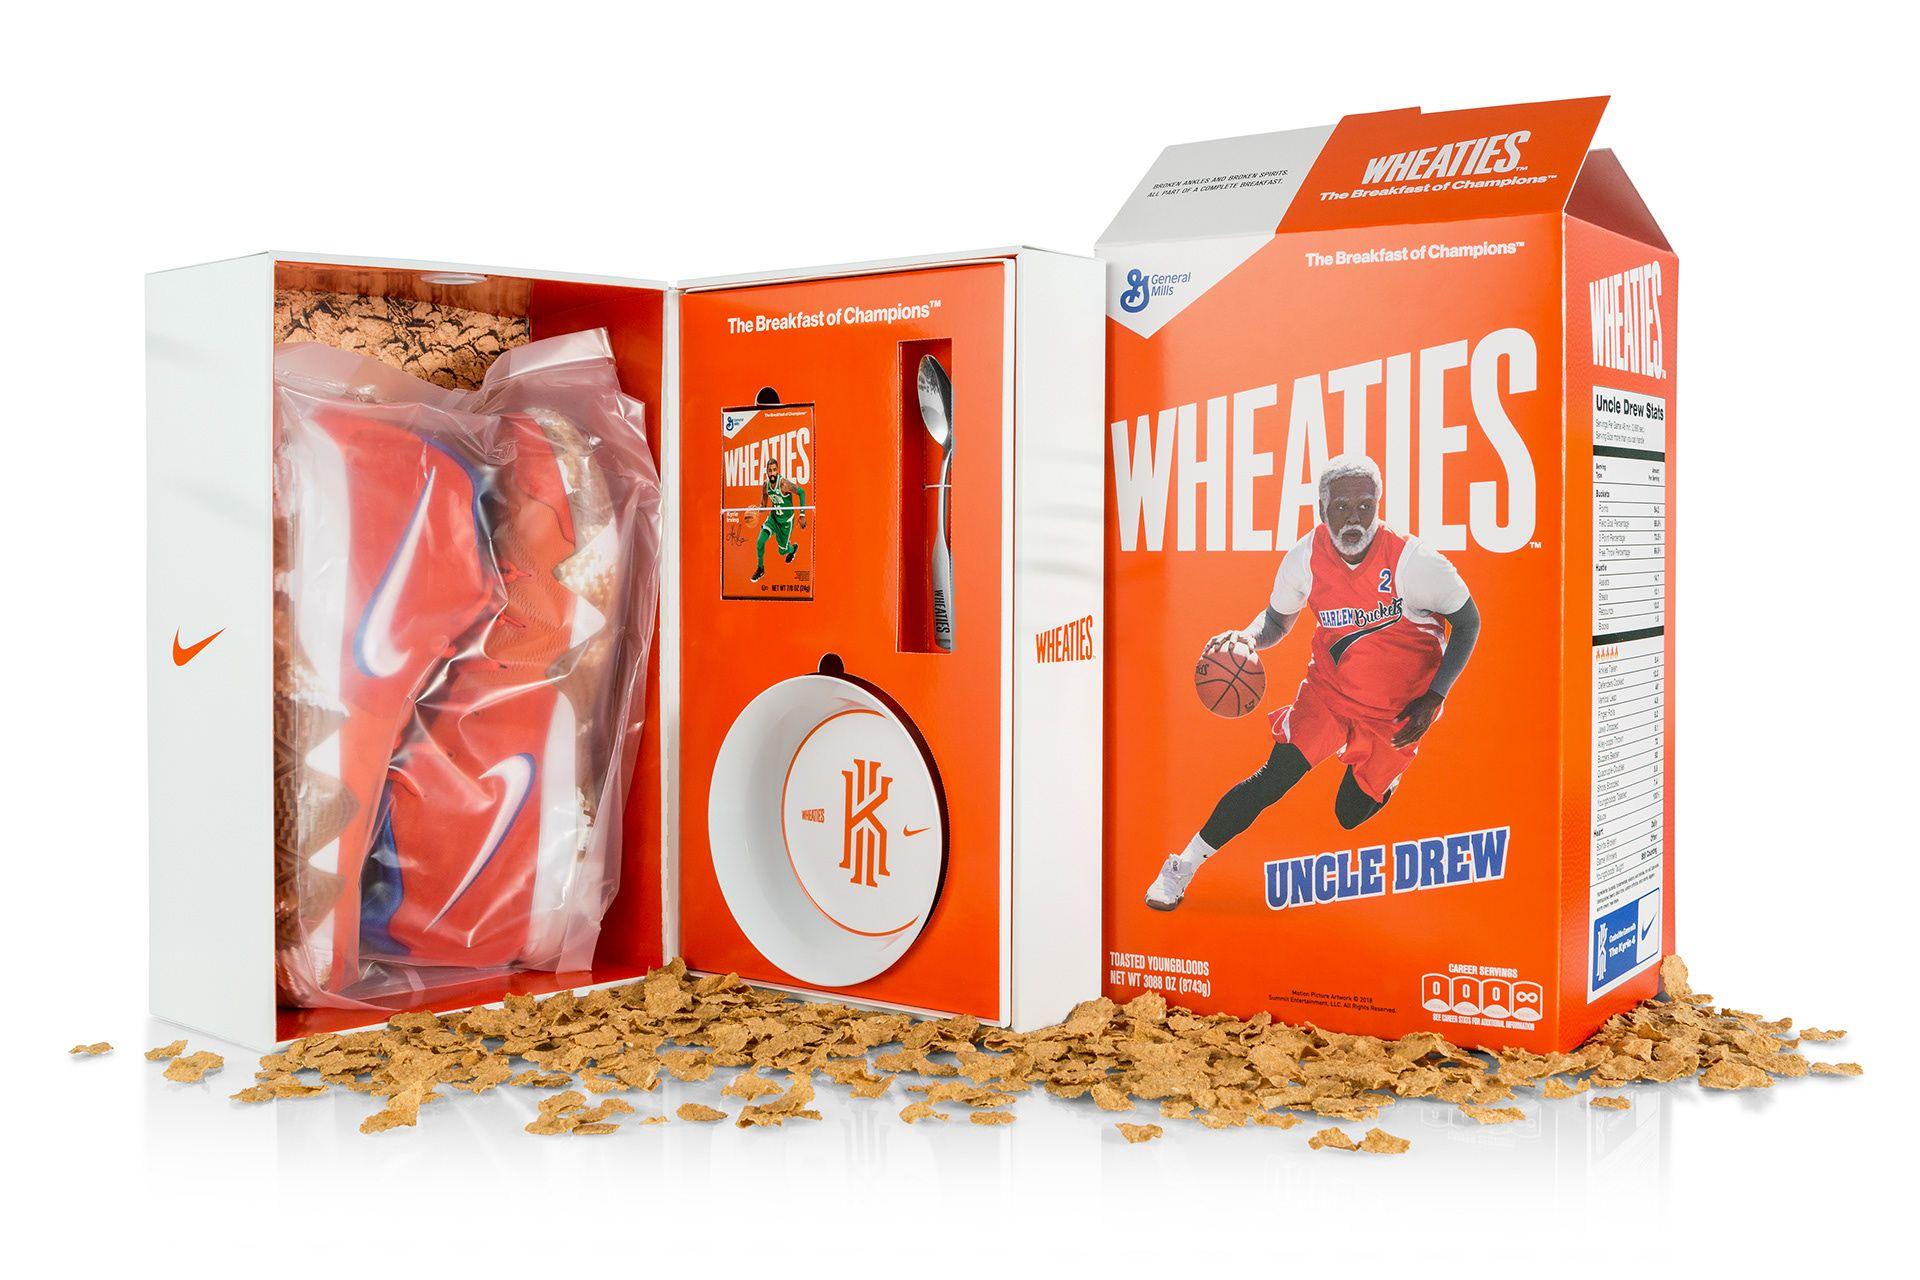 buy popular b39dd 9adc8 Kyrie 4 x Wheaties Kit | Design - Packaging in 2019 ...